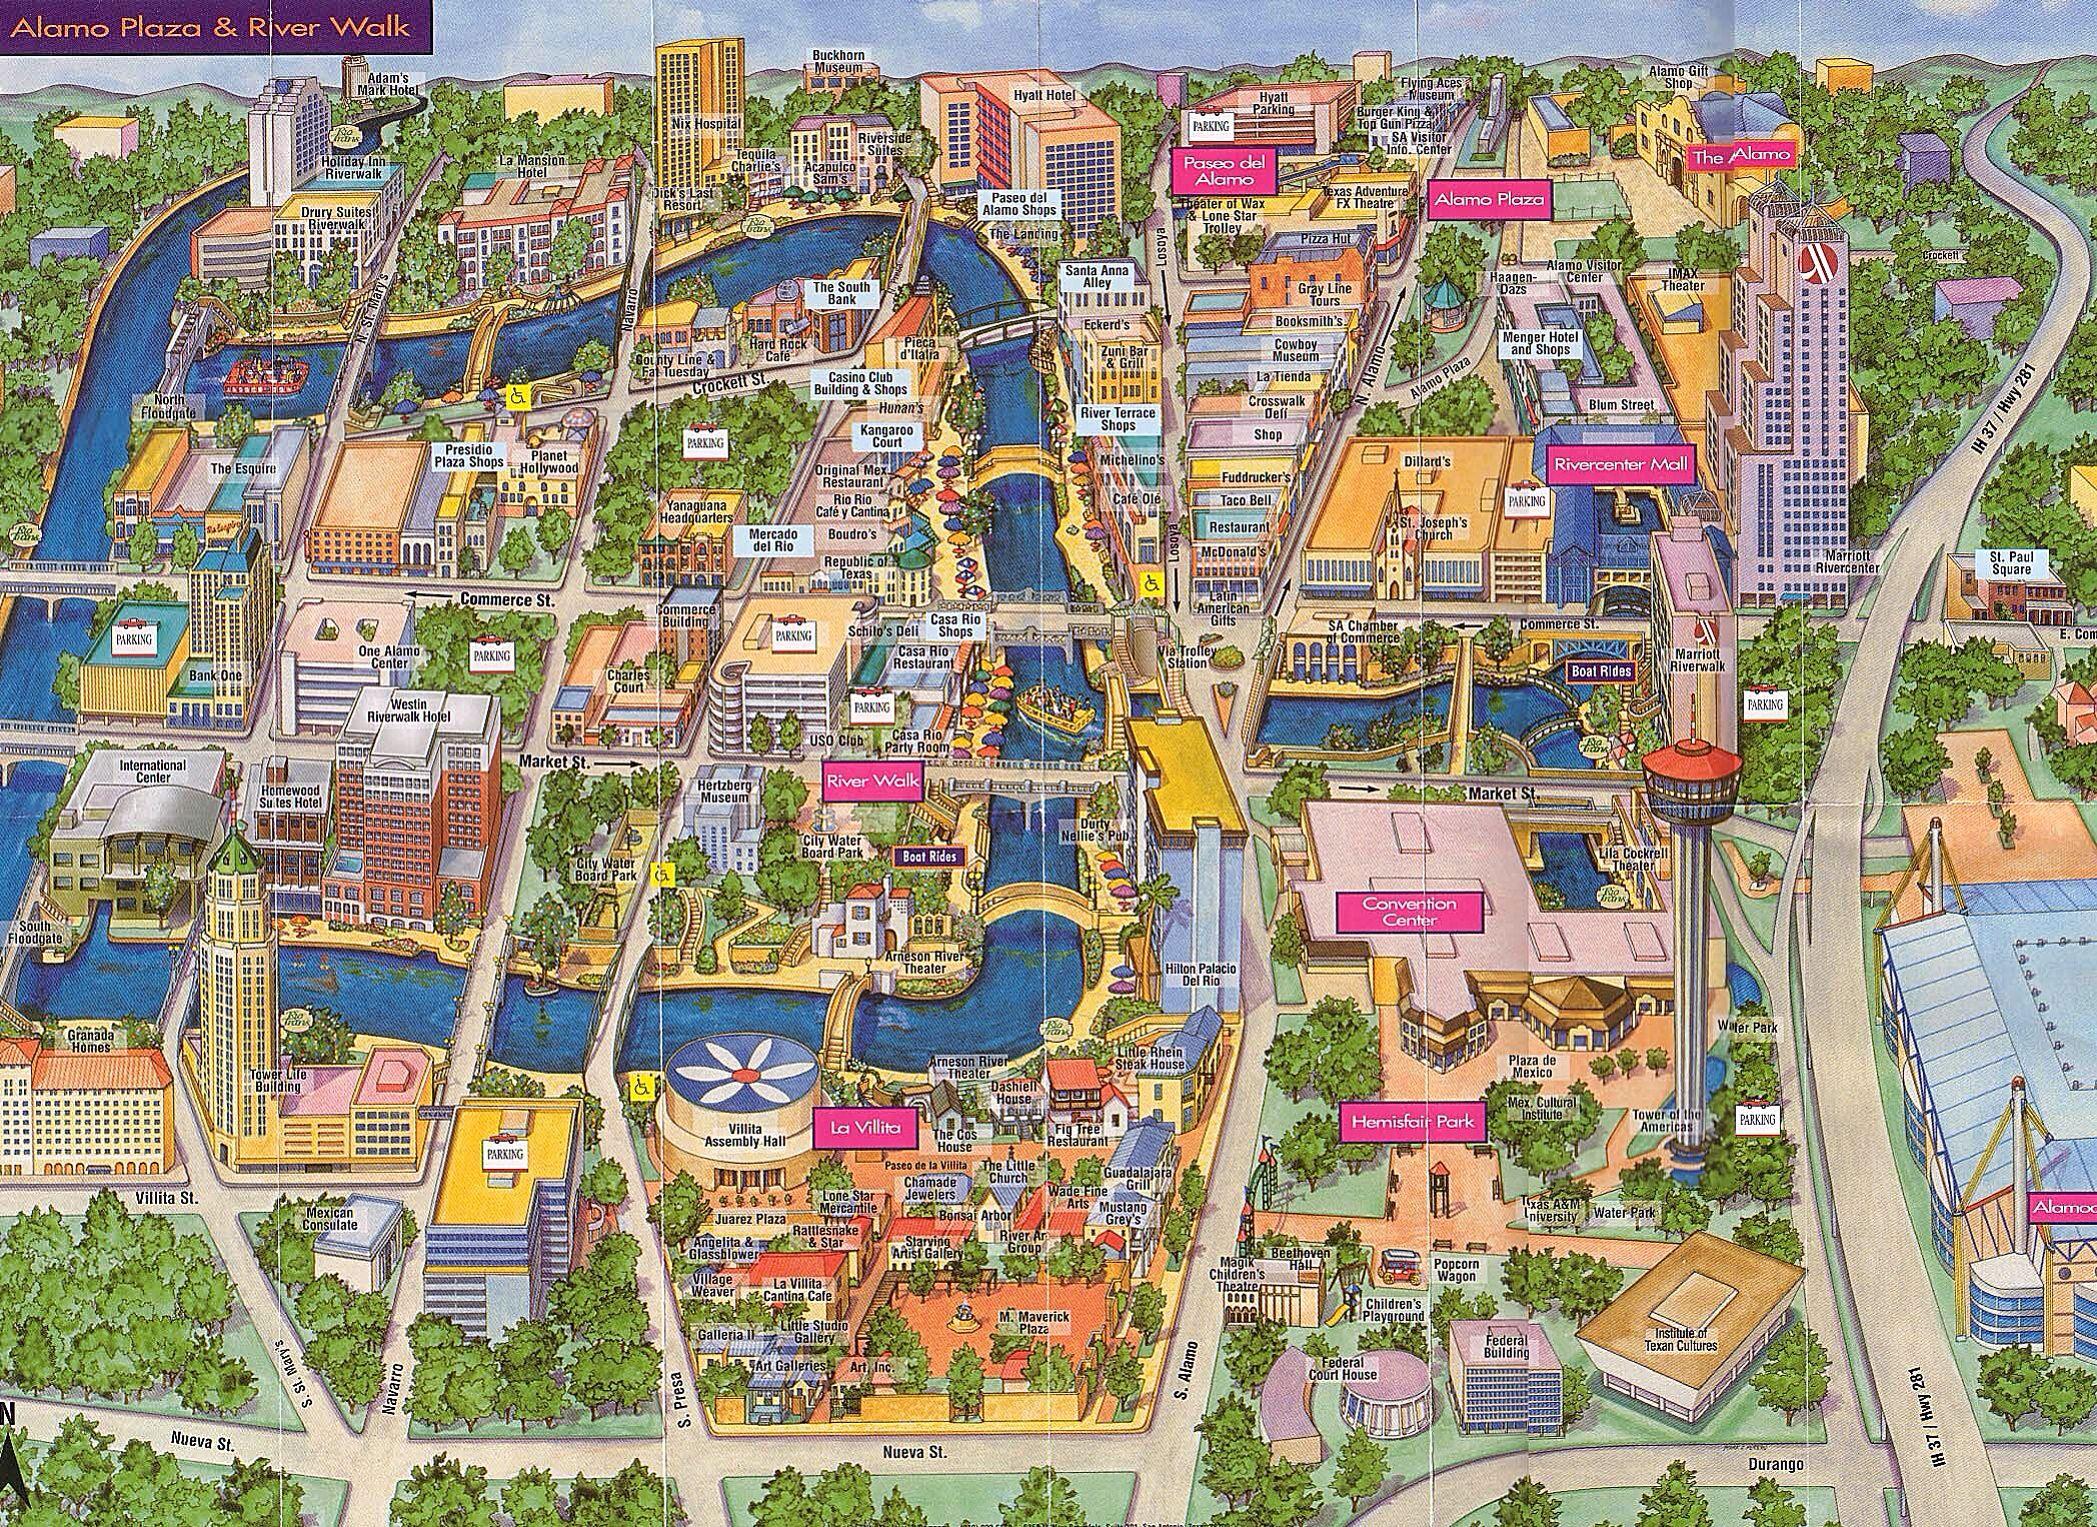 Map Of Alamo Plaza & River Walk | San Antonio, Tx | Www.mappery - Map Of The Alamo San Antonio Texas